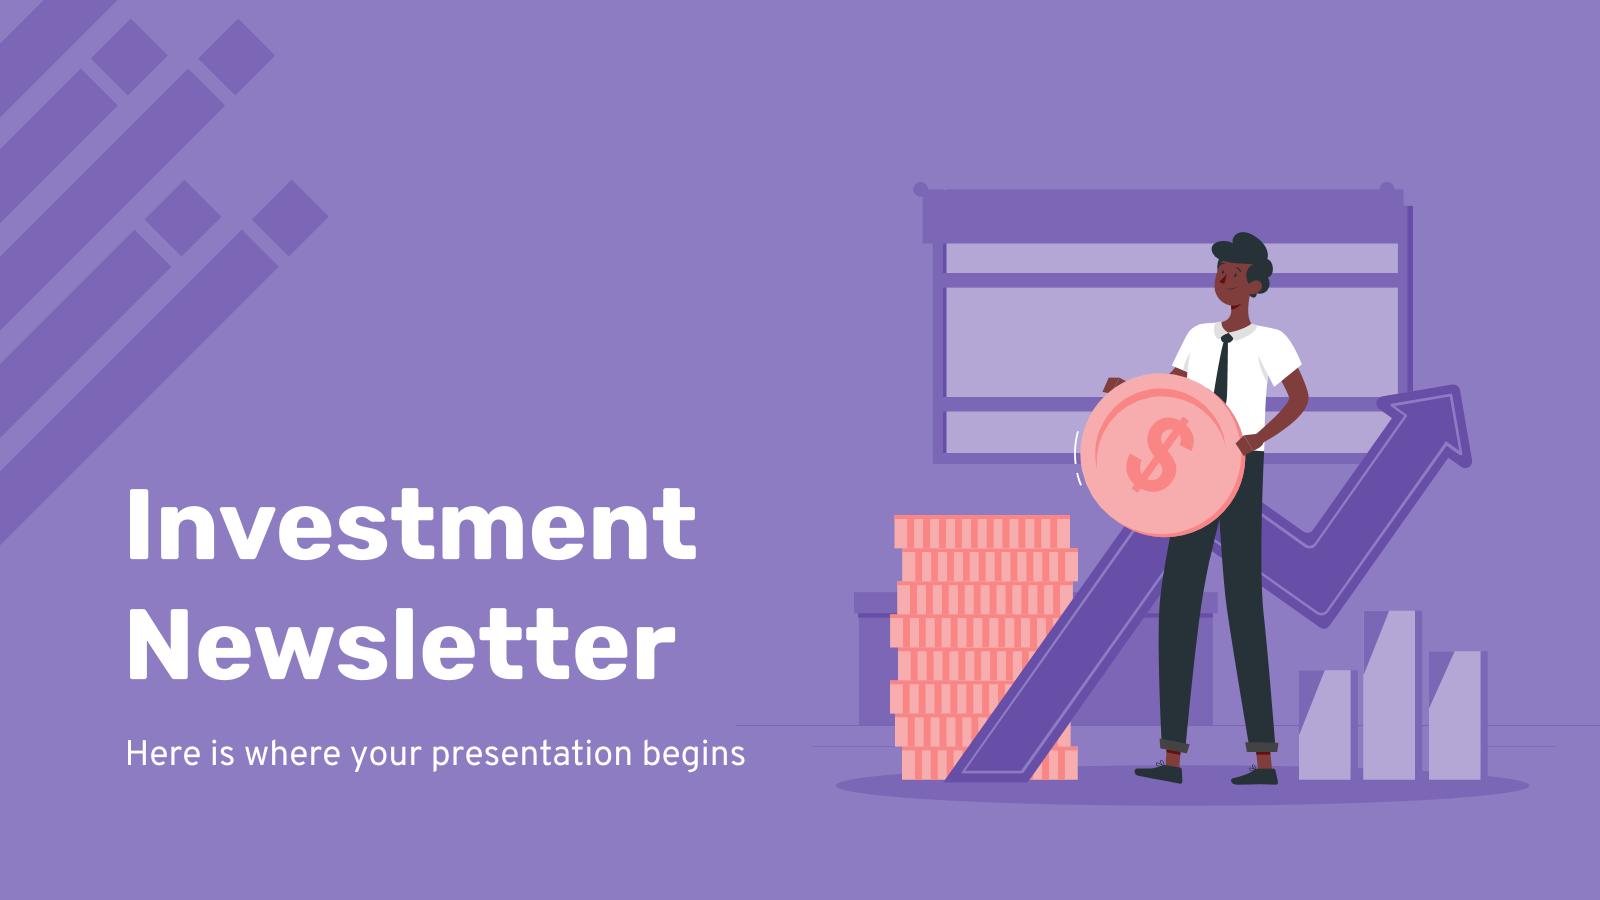 Investment Newsletter presentation template